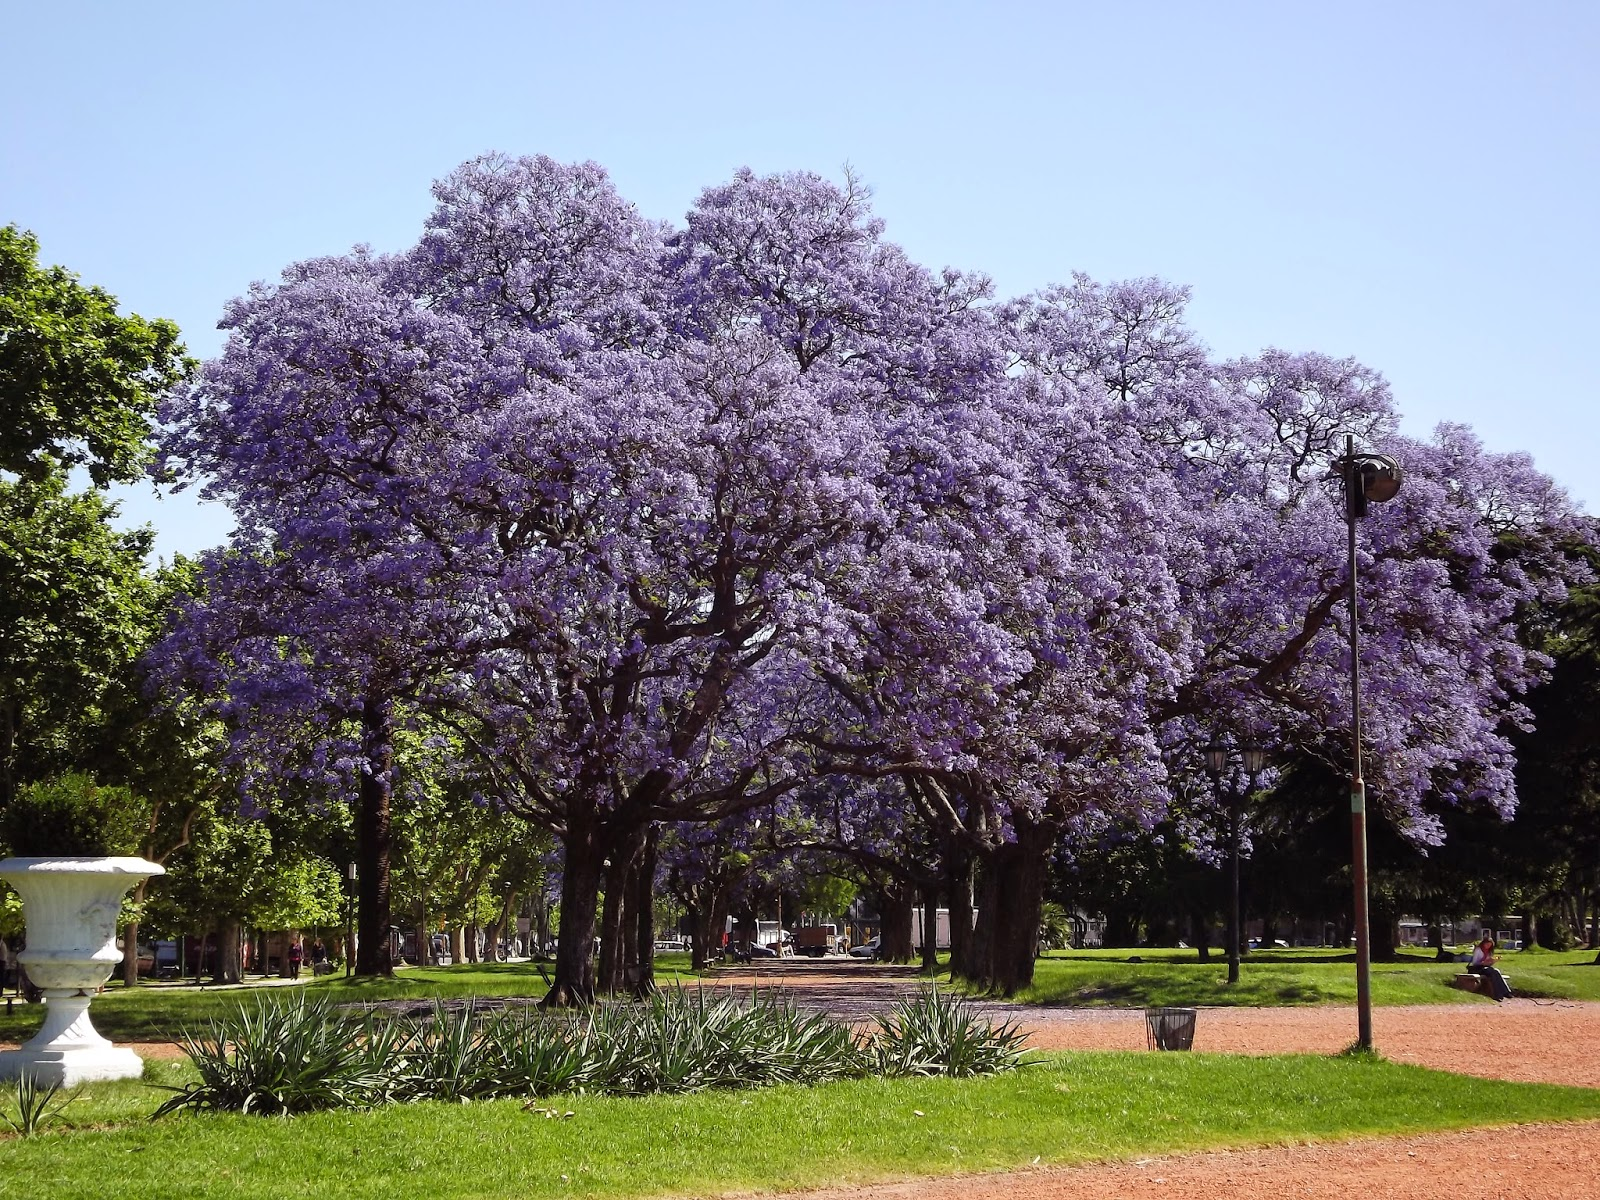 http://cadalugarumadica.blogspot.com.br/2014/09/buenos-aires-argentina-palermo.html